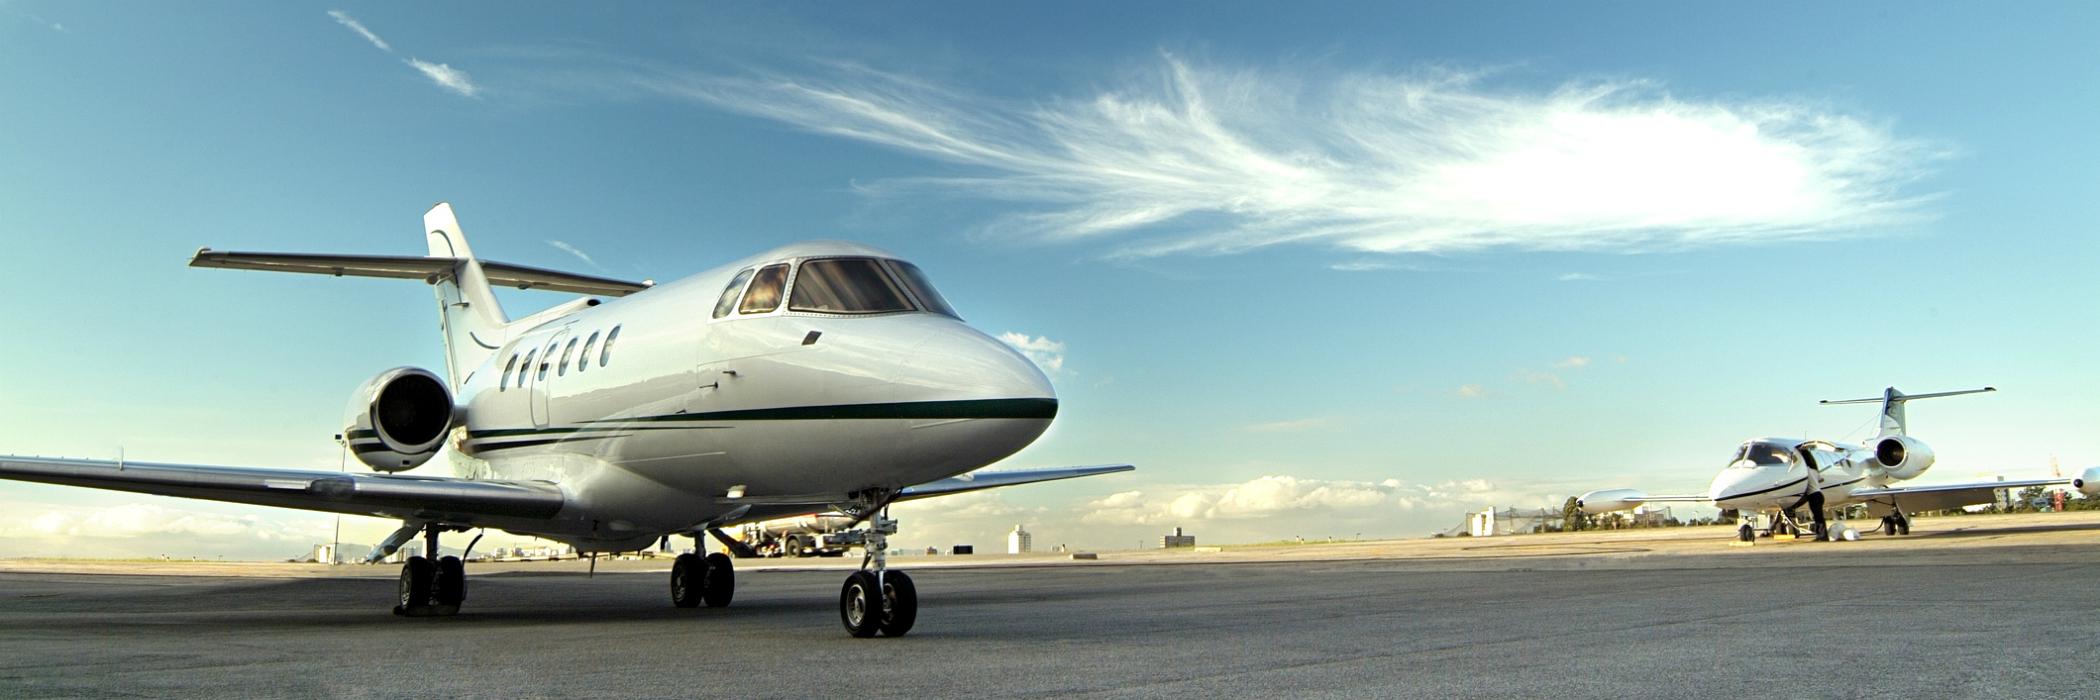 Gulfstream 5 on runway